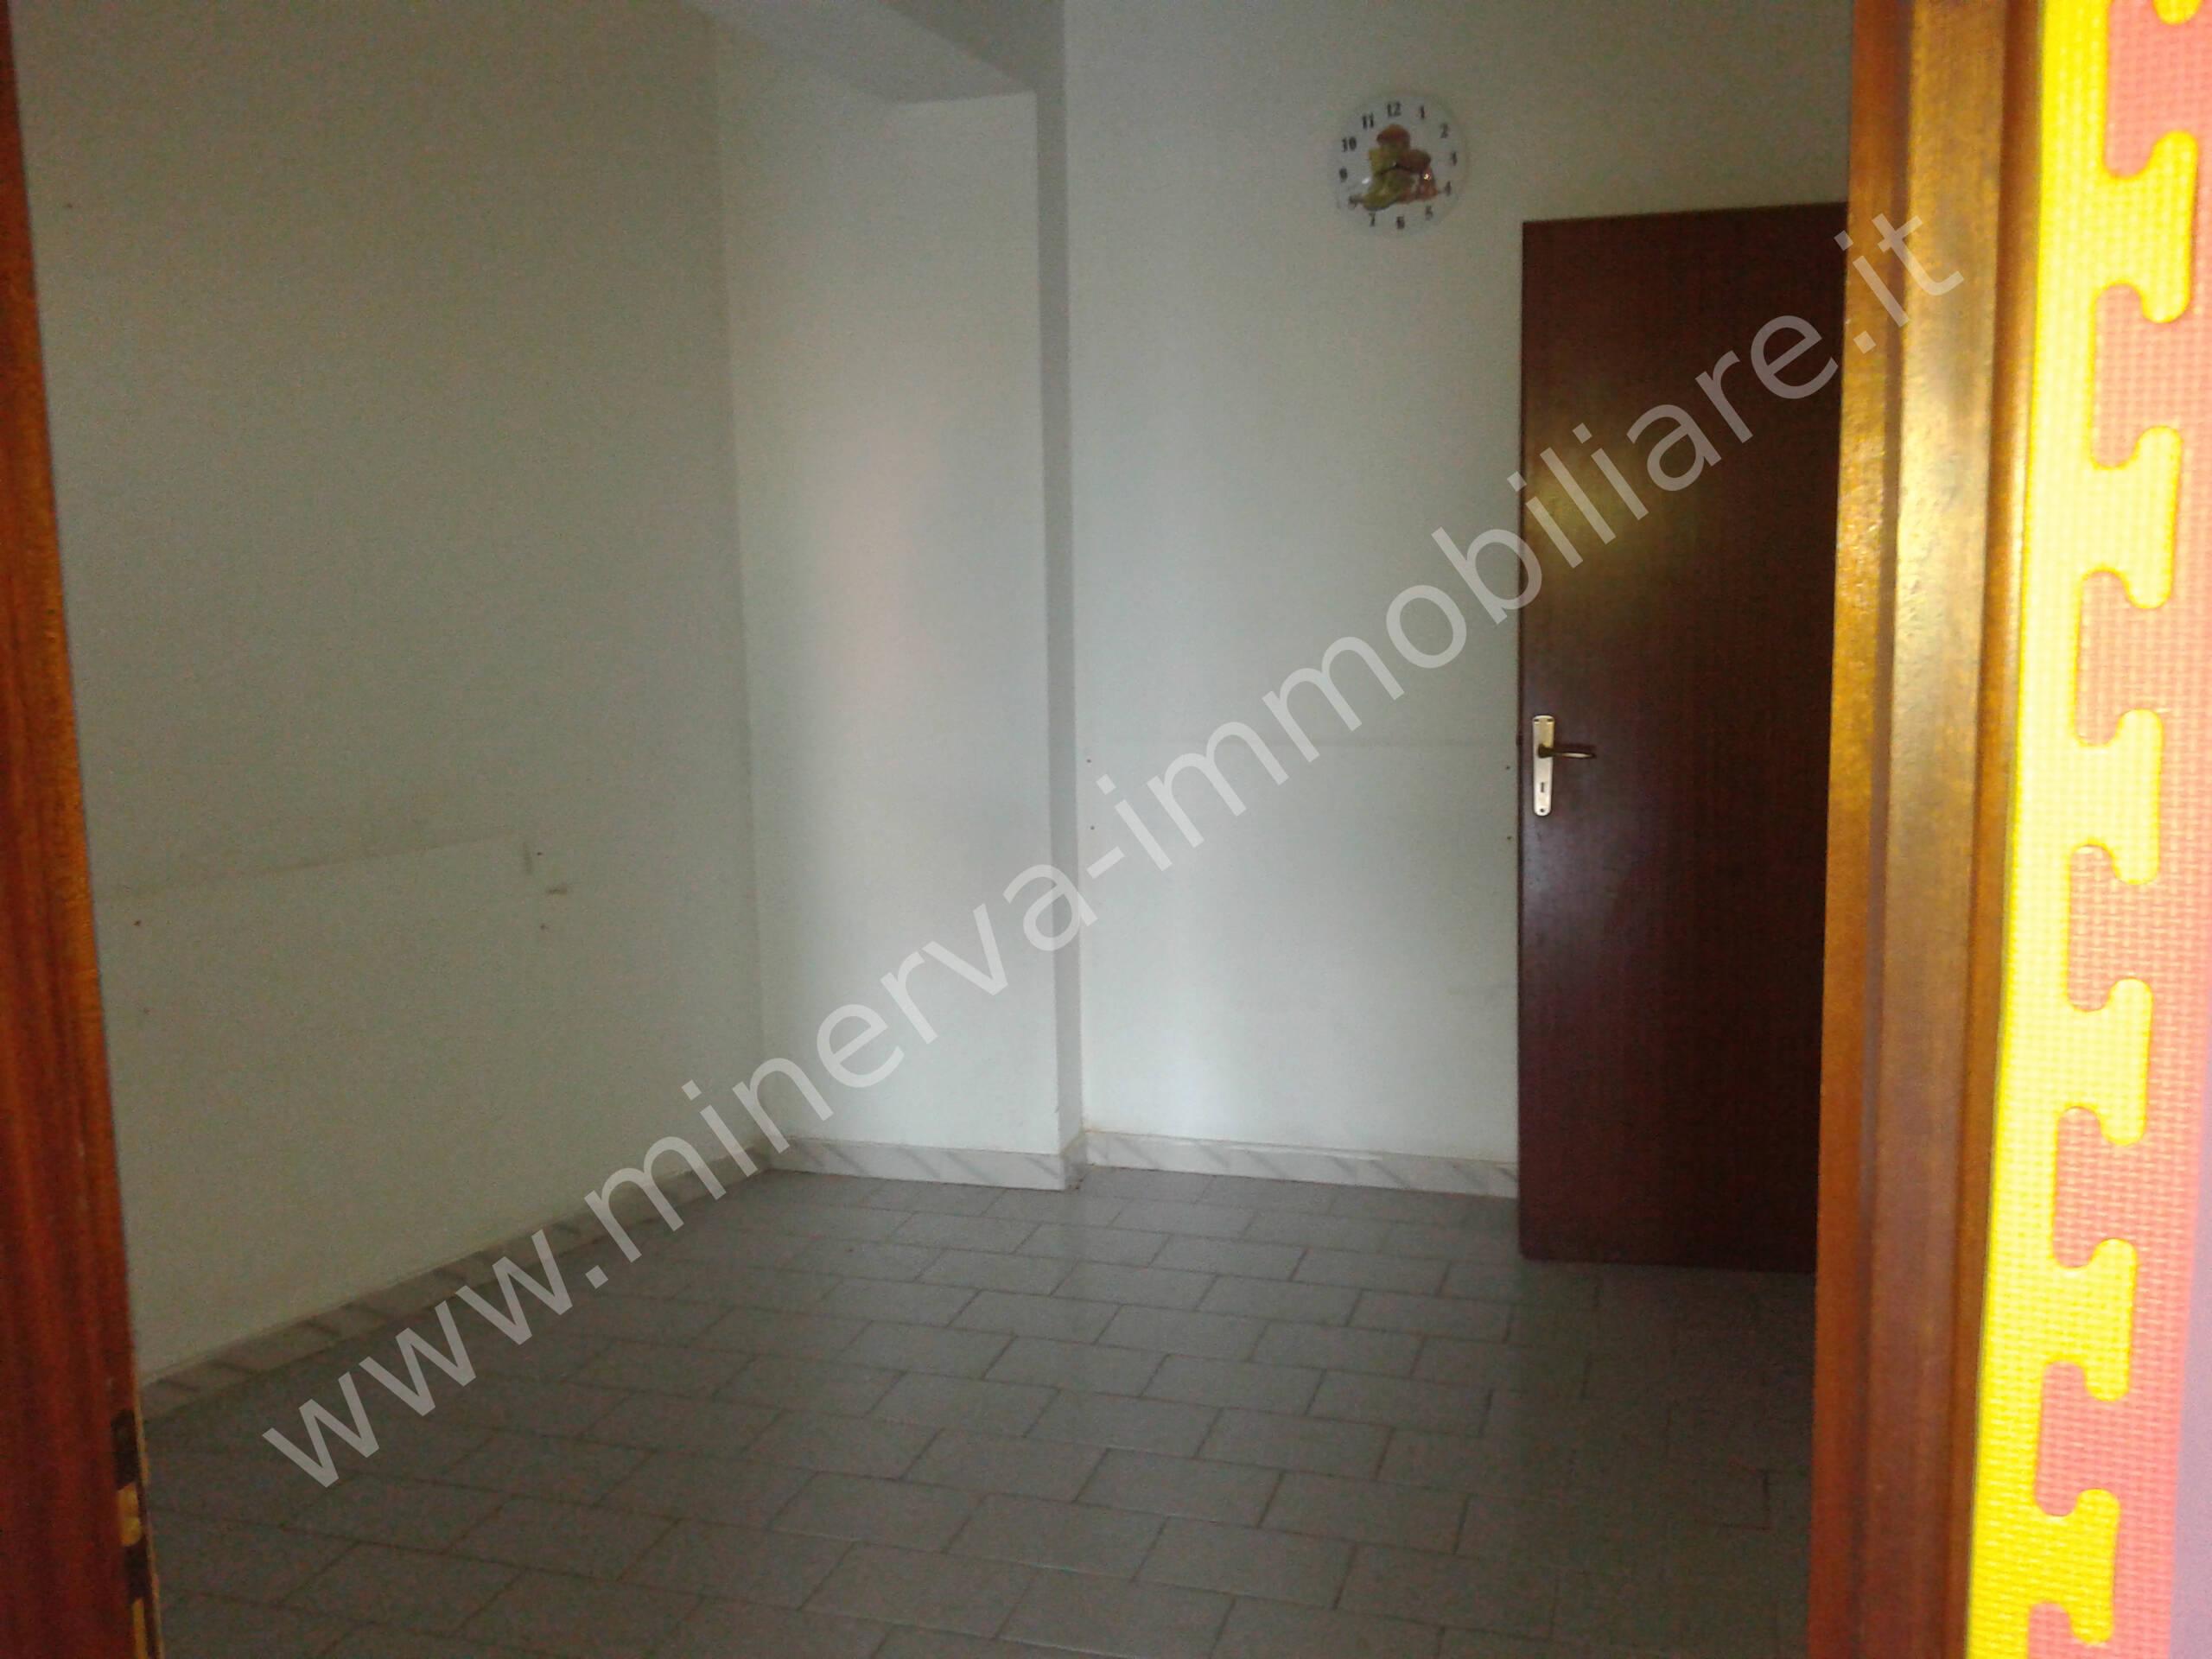 Locale in vendita/affitto Carlentini Santuzzi